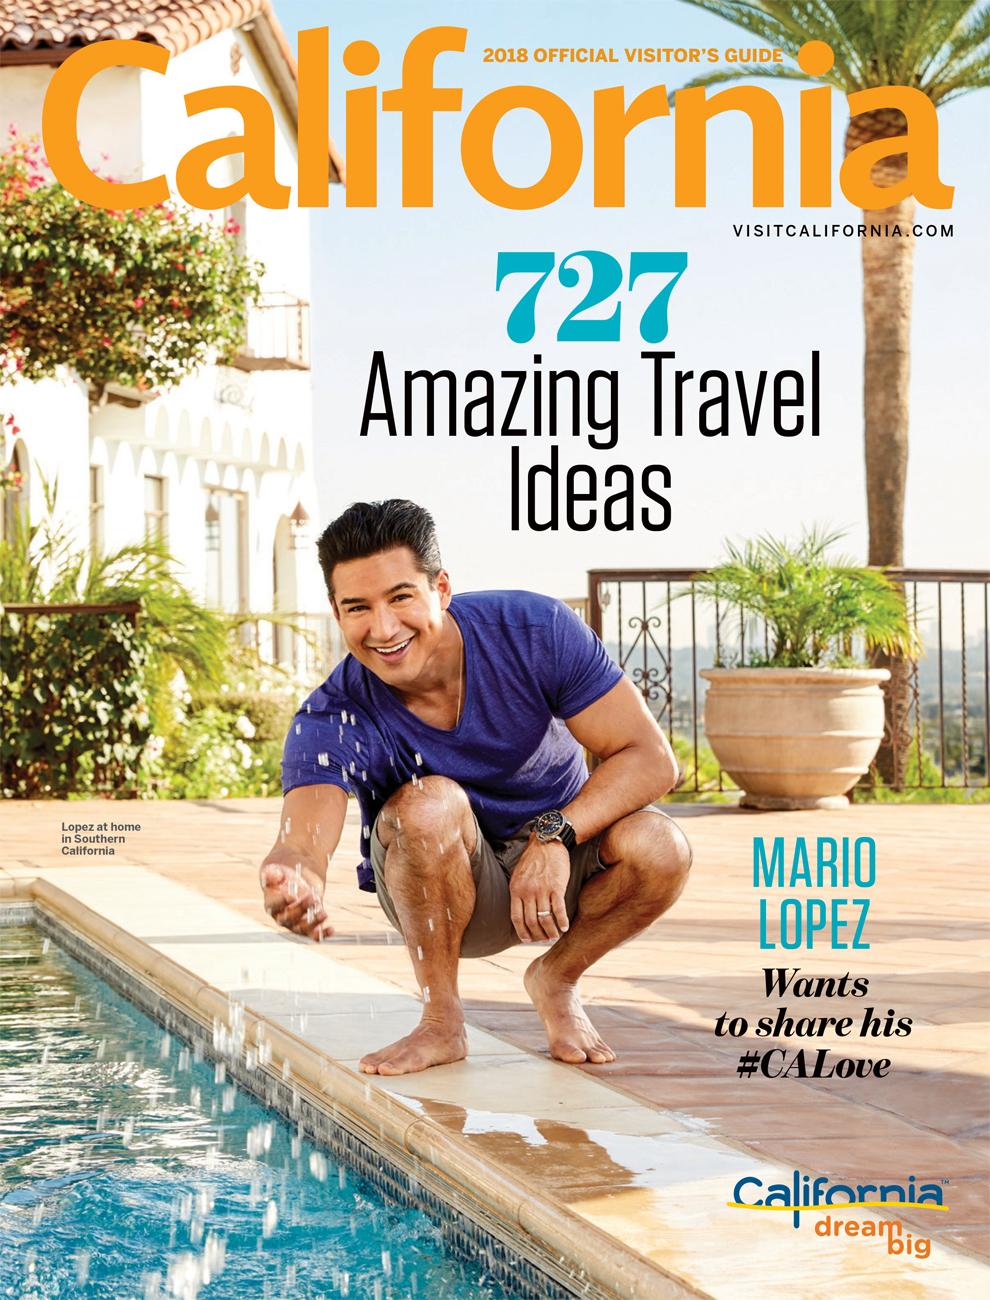 mario.lopez.cover.jpg